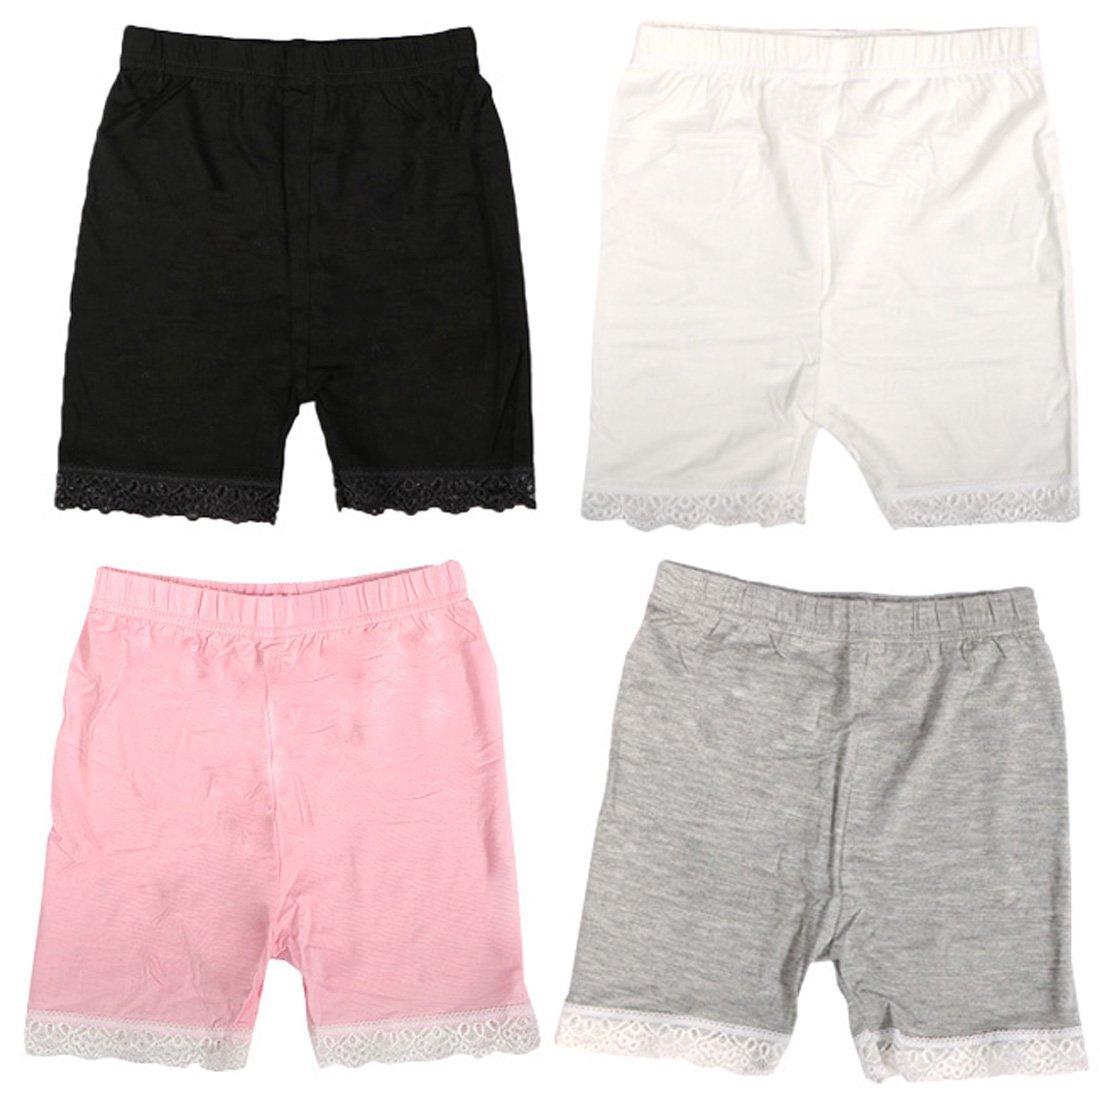 MyKazoe Girls Bike Shorts With Lace Trim (4T/5T, Basics (Black, White, Grey, Pink))